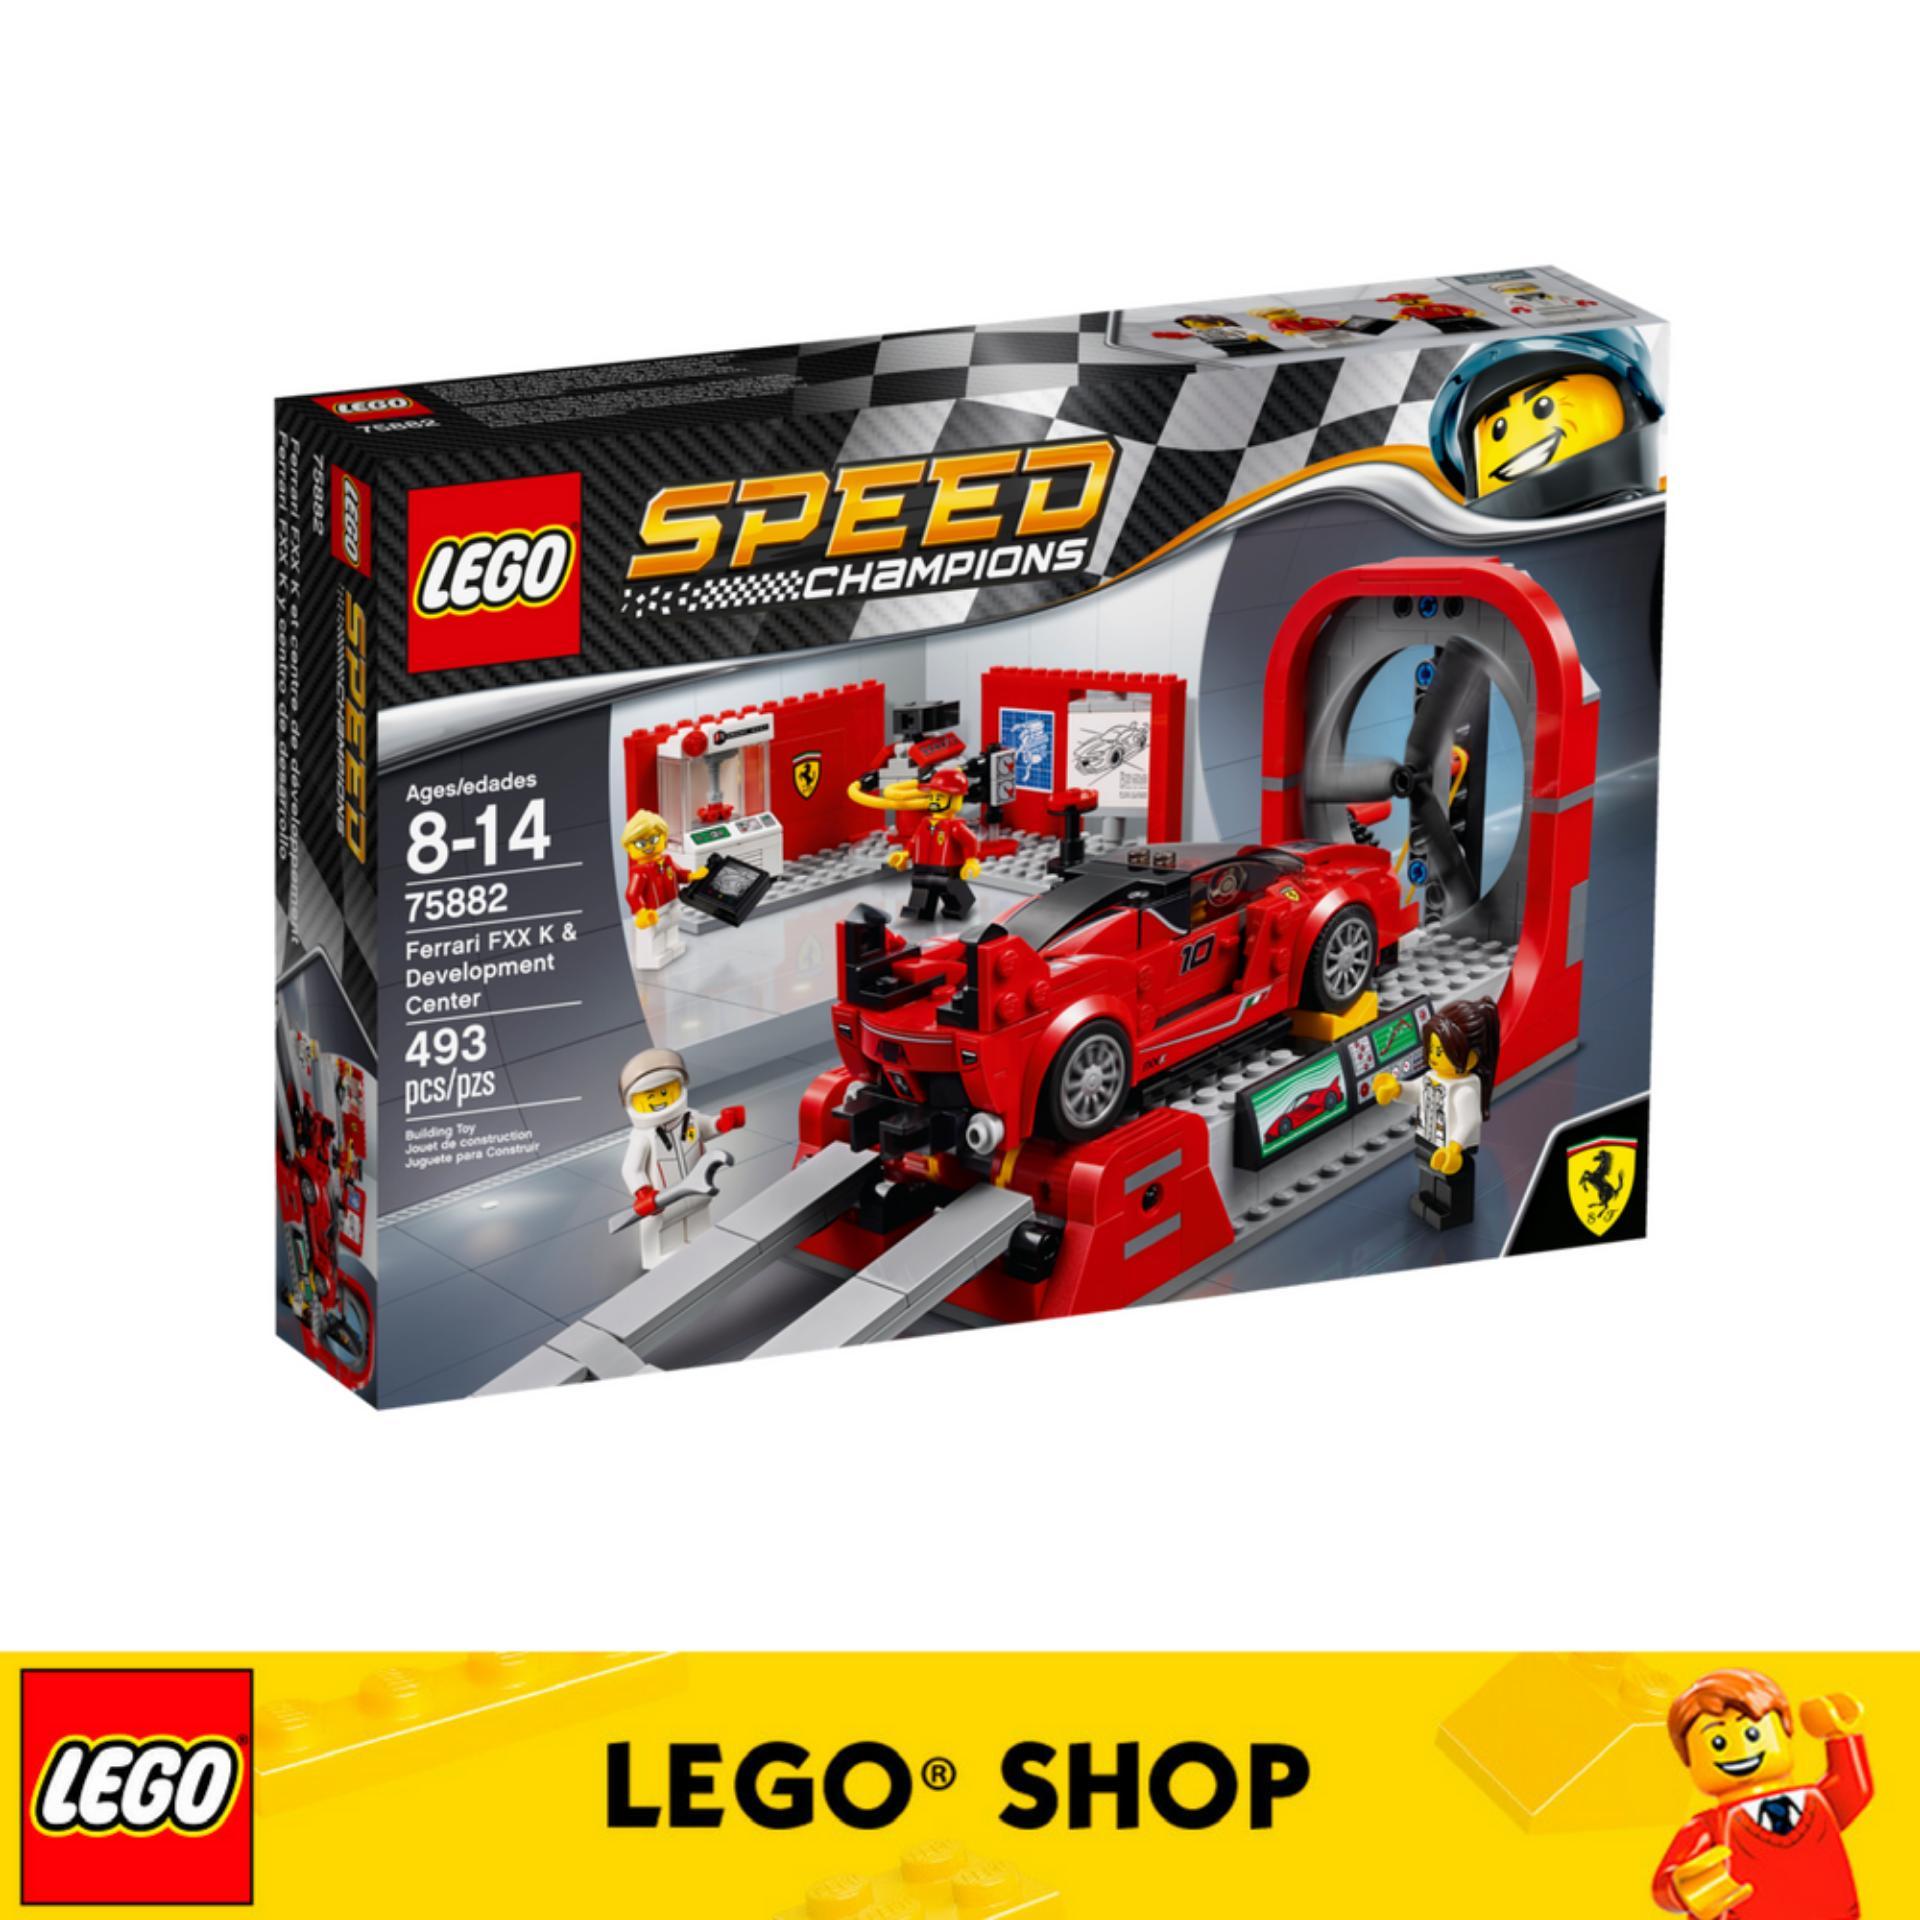 Who Sells Lego® Speed Champions Ferrari Fxx K Development Center 75882